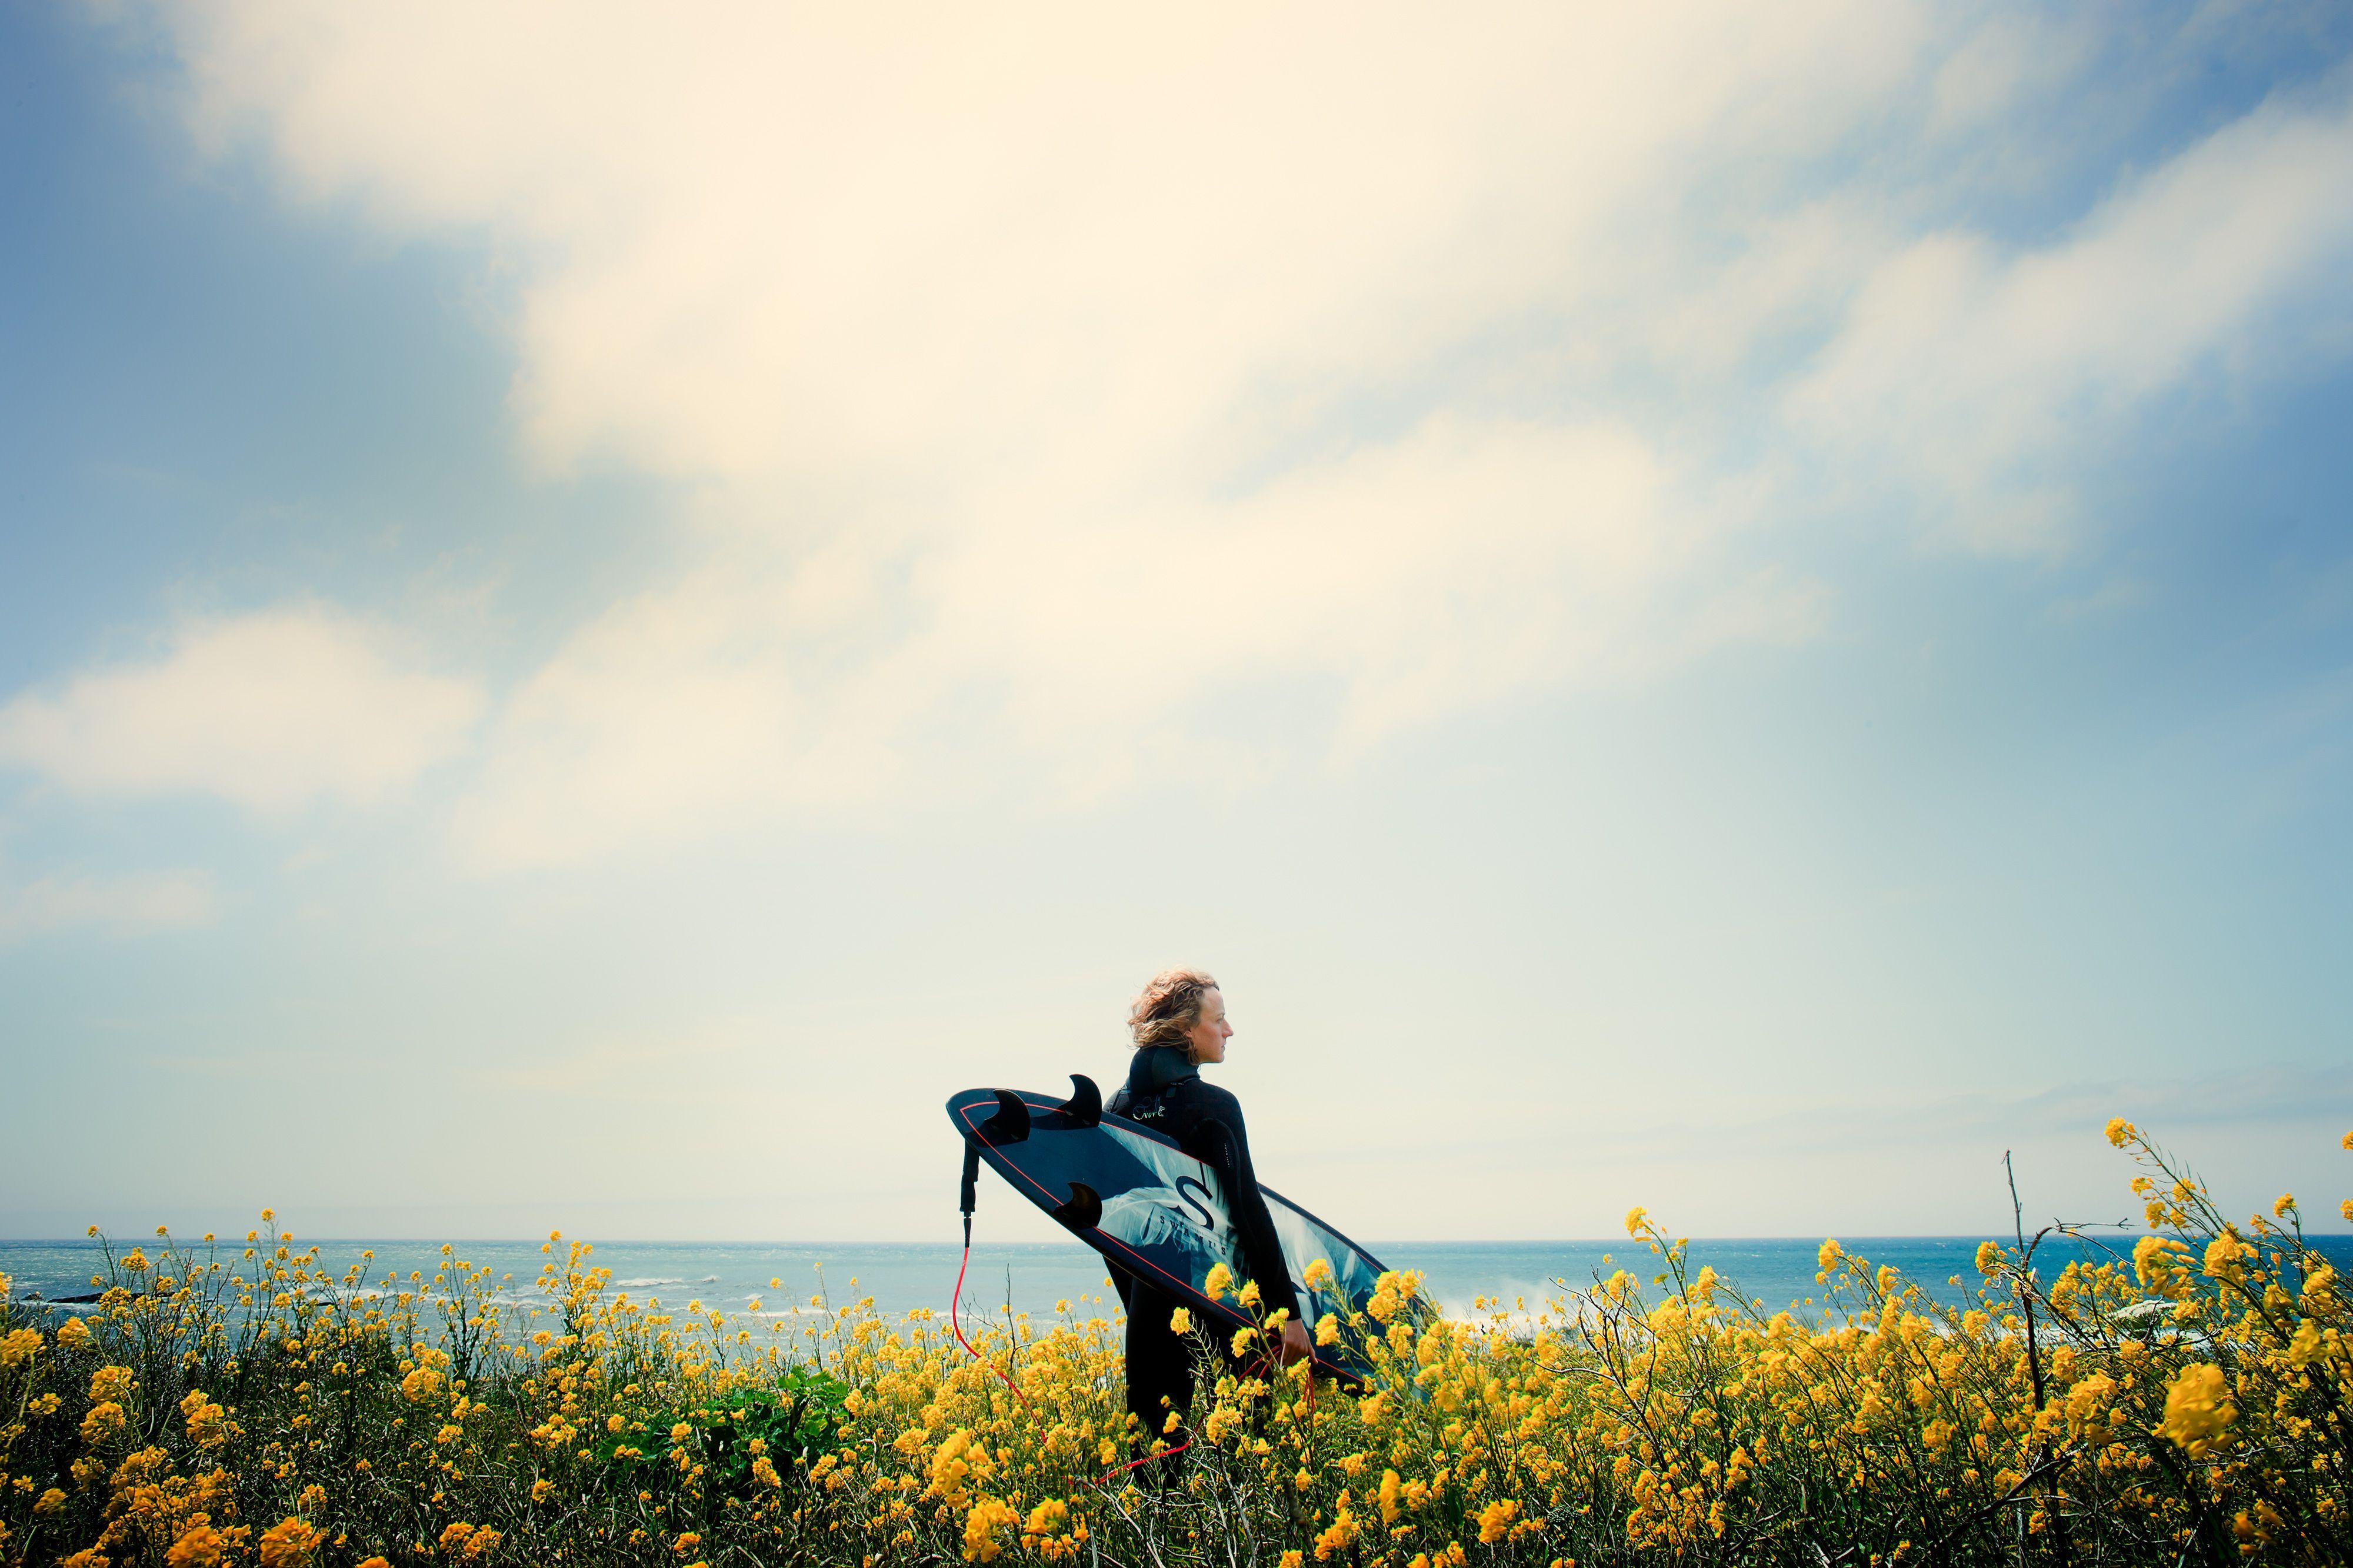 Surfer, Swami Surfboard, Flowers, California, Travel, Sports, Adventure